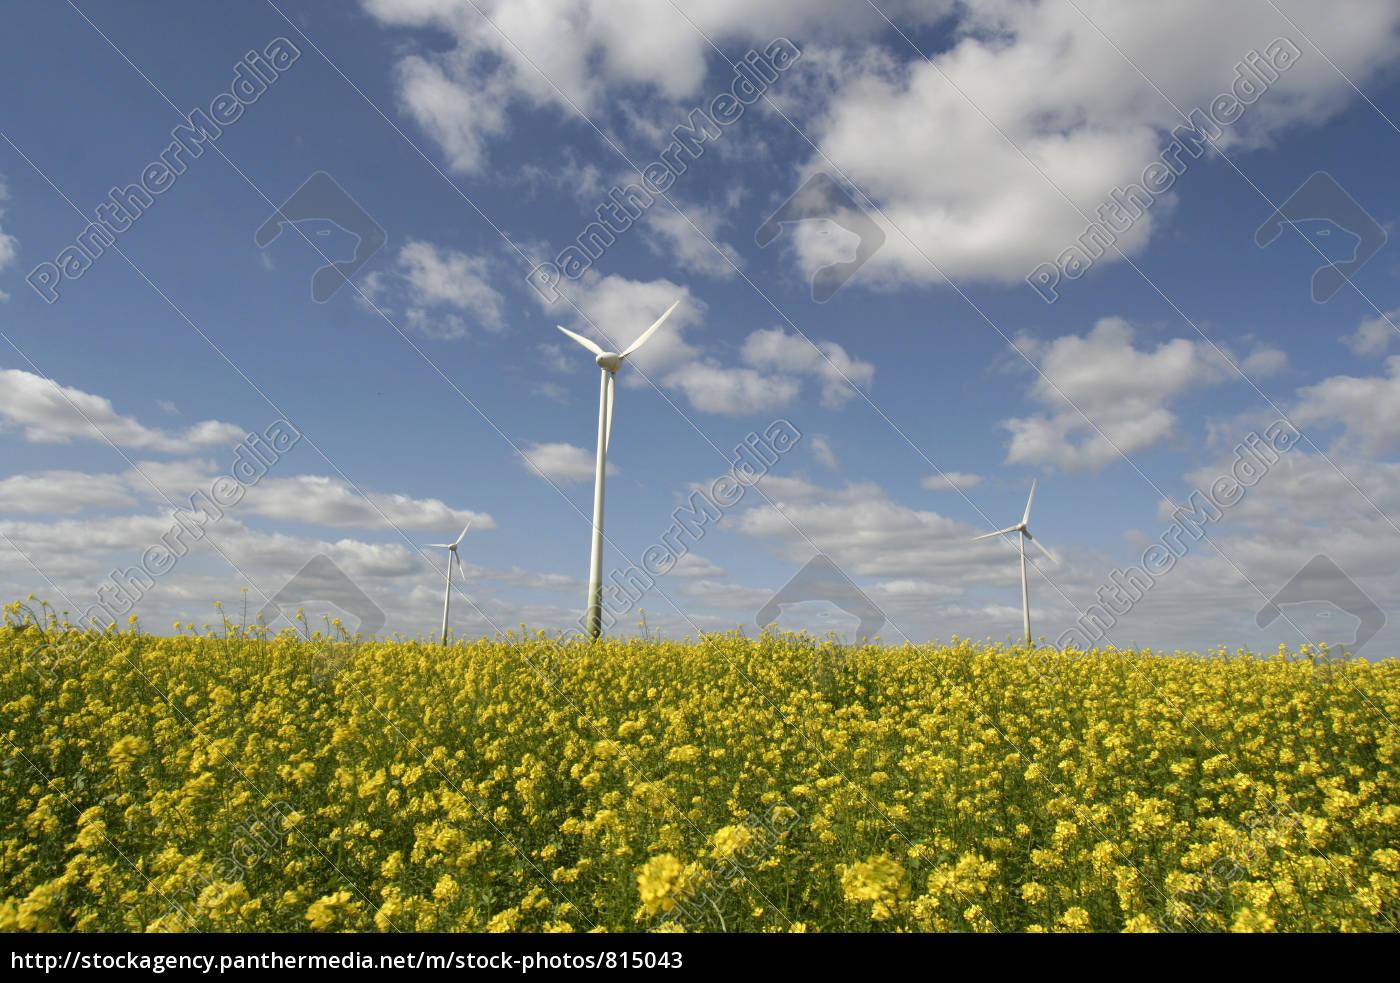 canola, field, with, wind, turbine - 815043